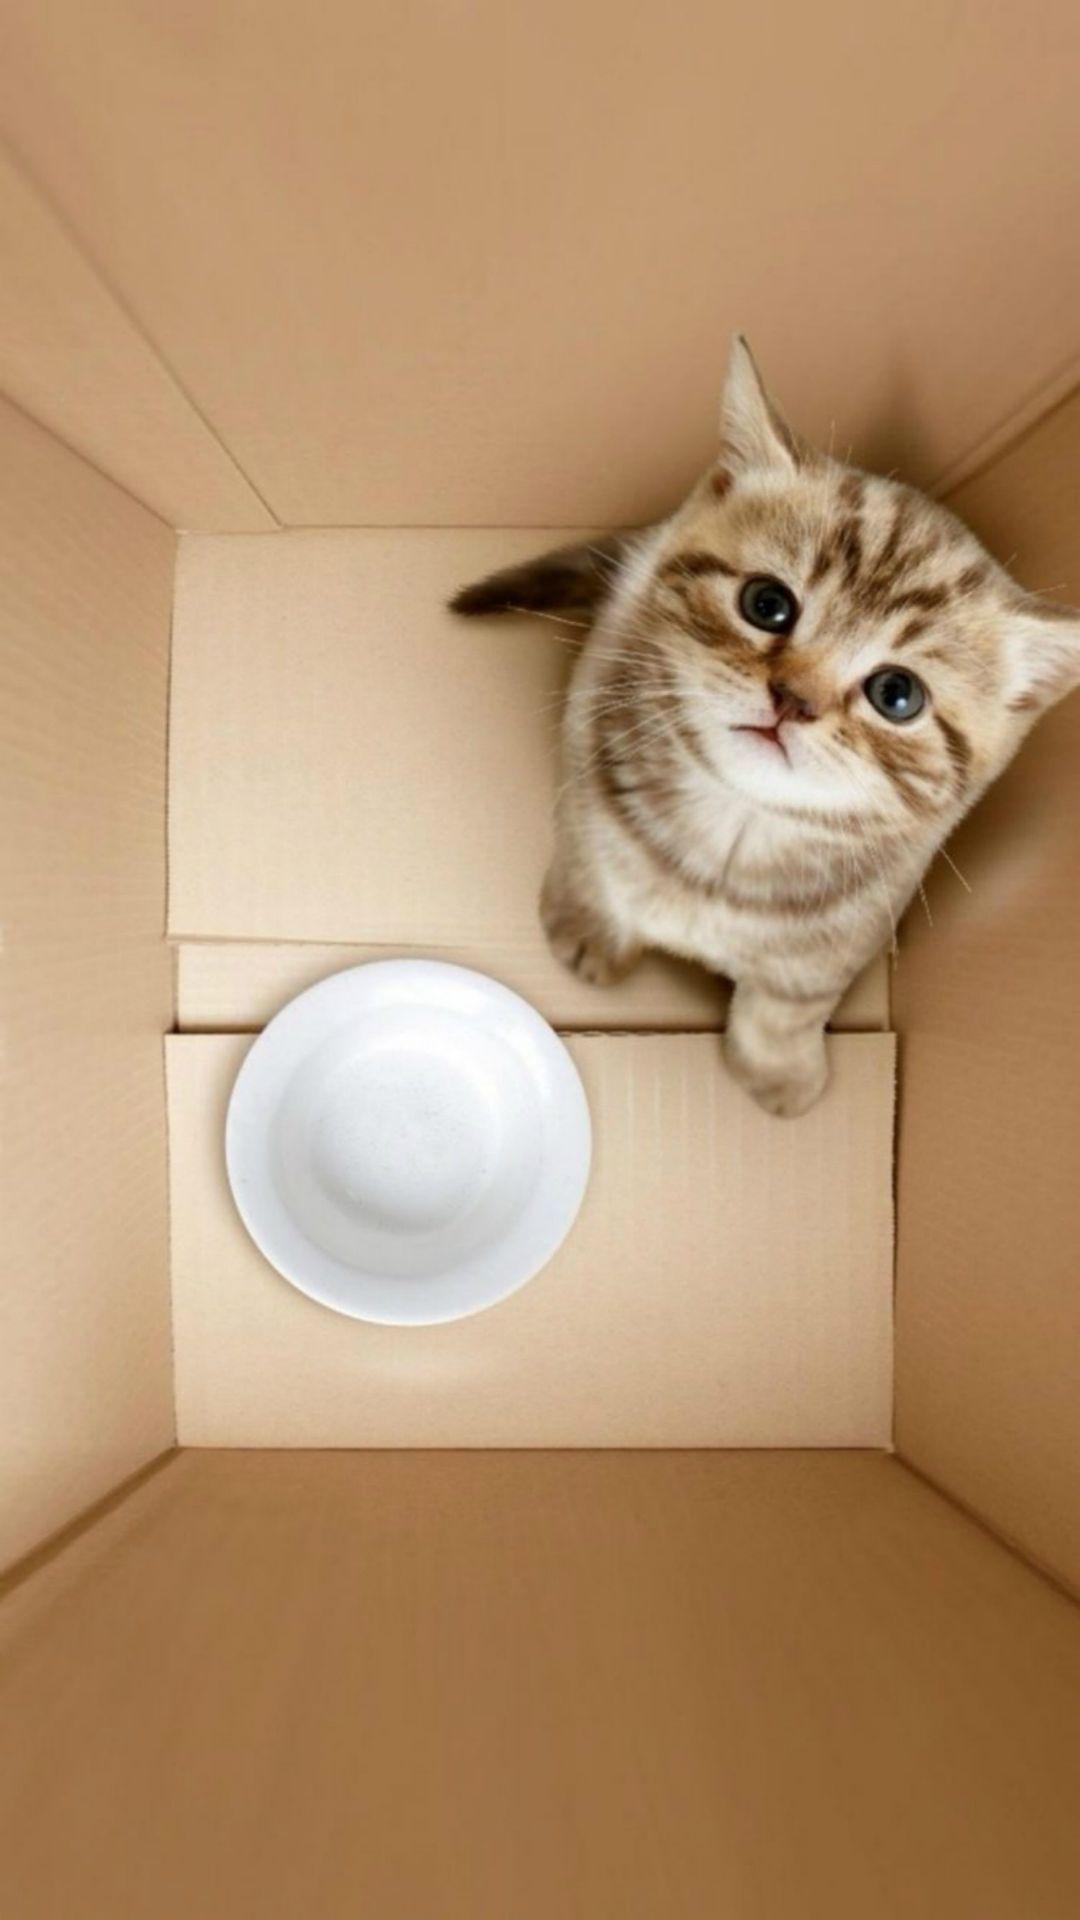 Dimensional 3d Poor Kitten In Box Iphone 6 Wallpaper Iphone Wallpaper Cat Cats Iphone Animals